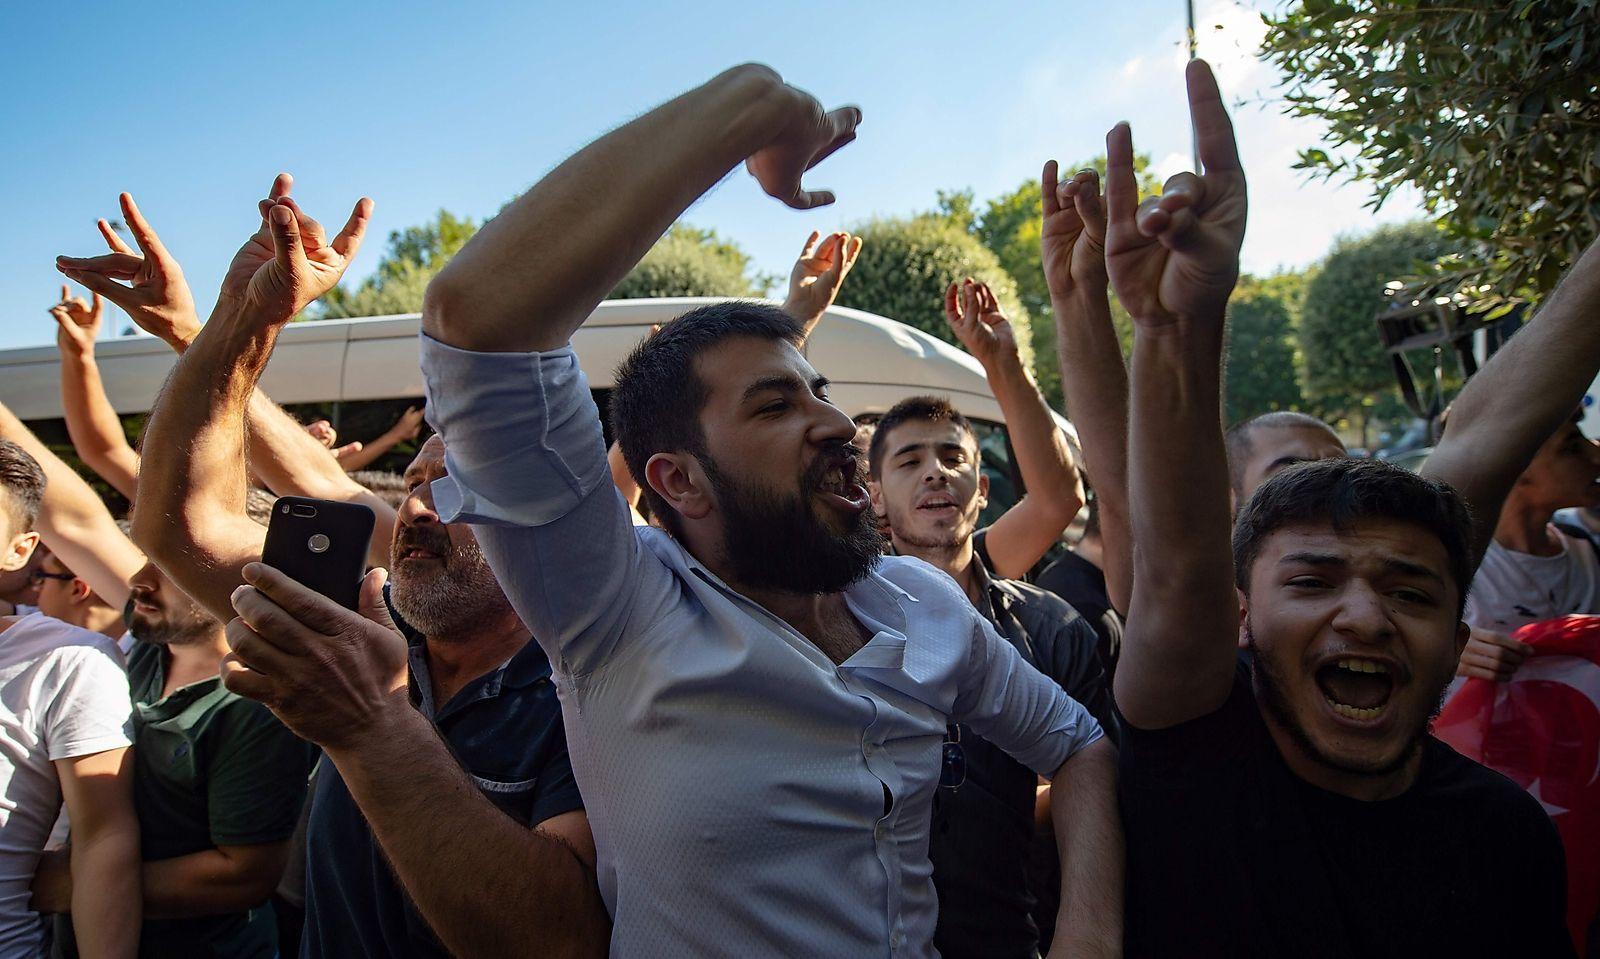 TURKEY-DEMO-POLITICS-REFUGEES